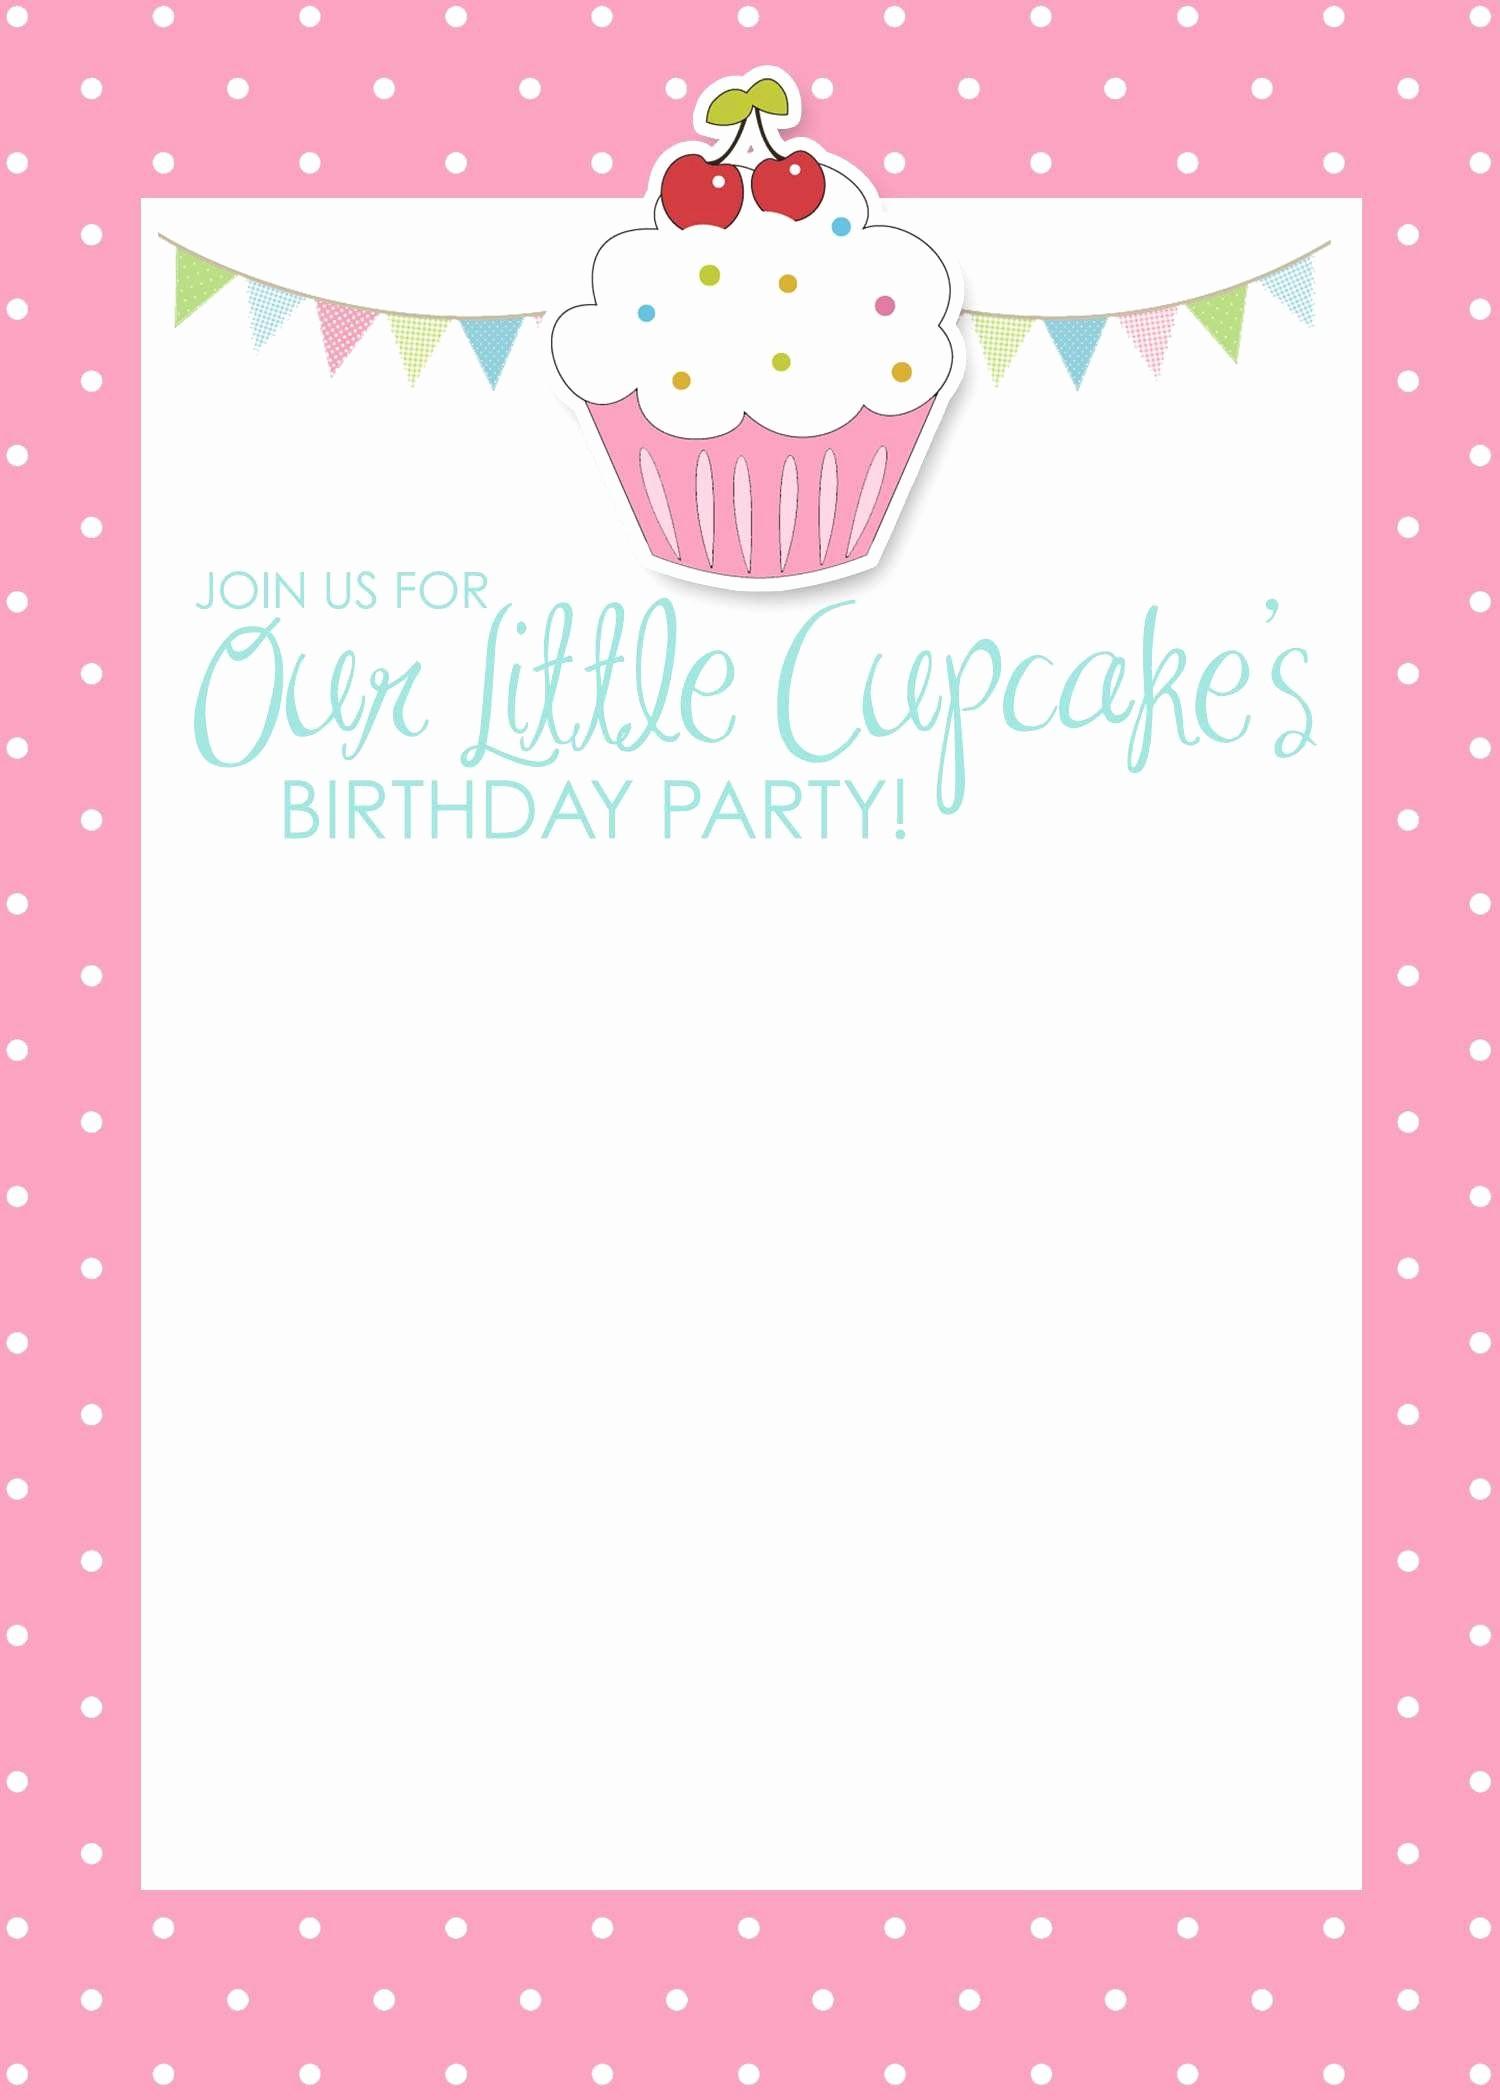 Birthday Invitation Card Template Free New Birthday Invitation Card Template Free